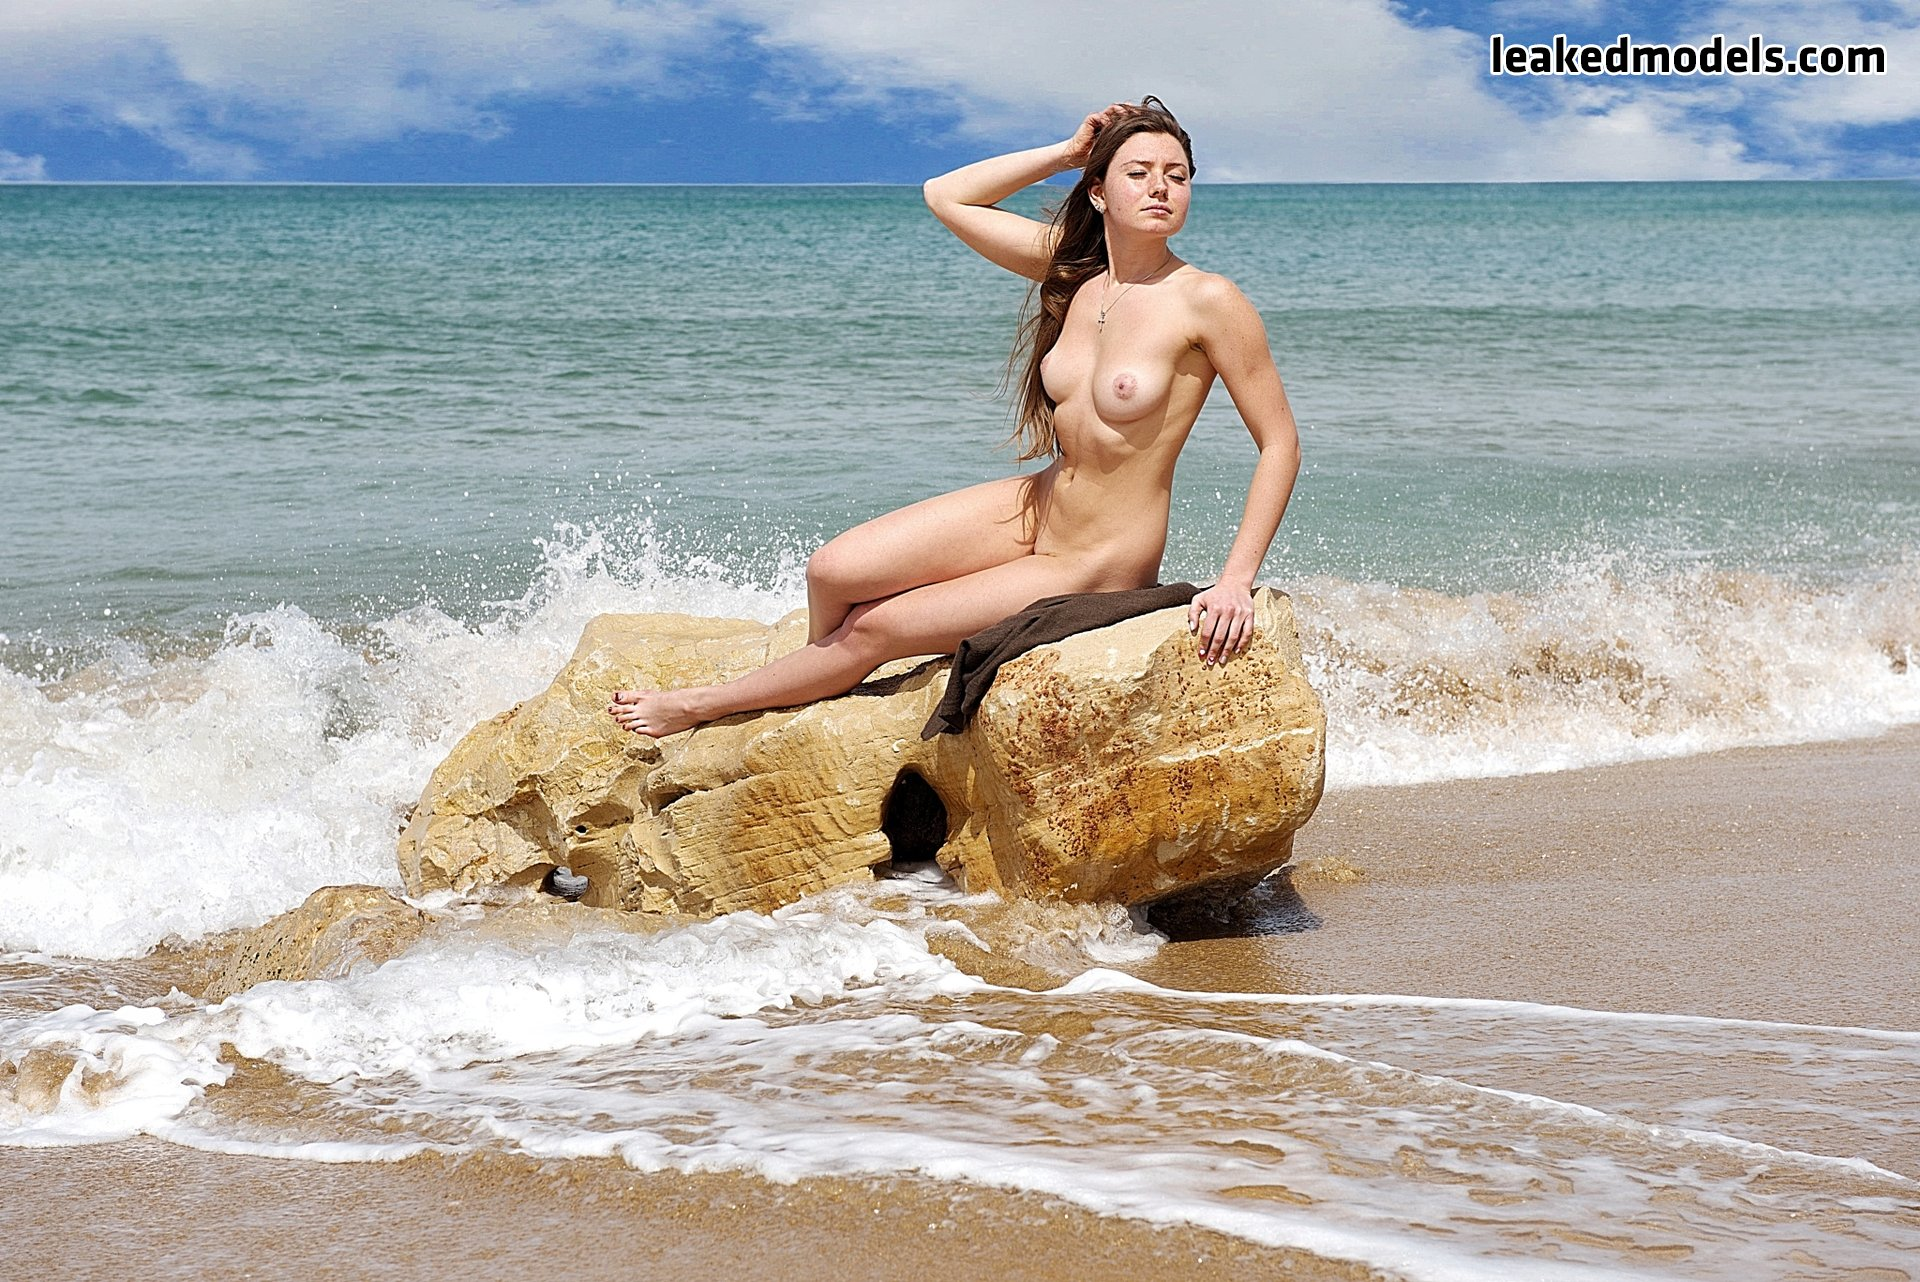 olya golubenko leaked nude leakedmodels.com 0009 - Olya Golubenko Instagram Nude Leaks (33 Photos)